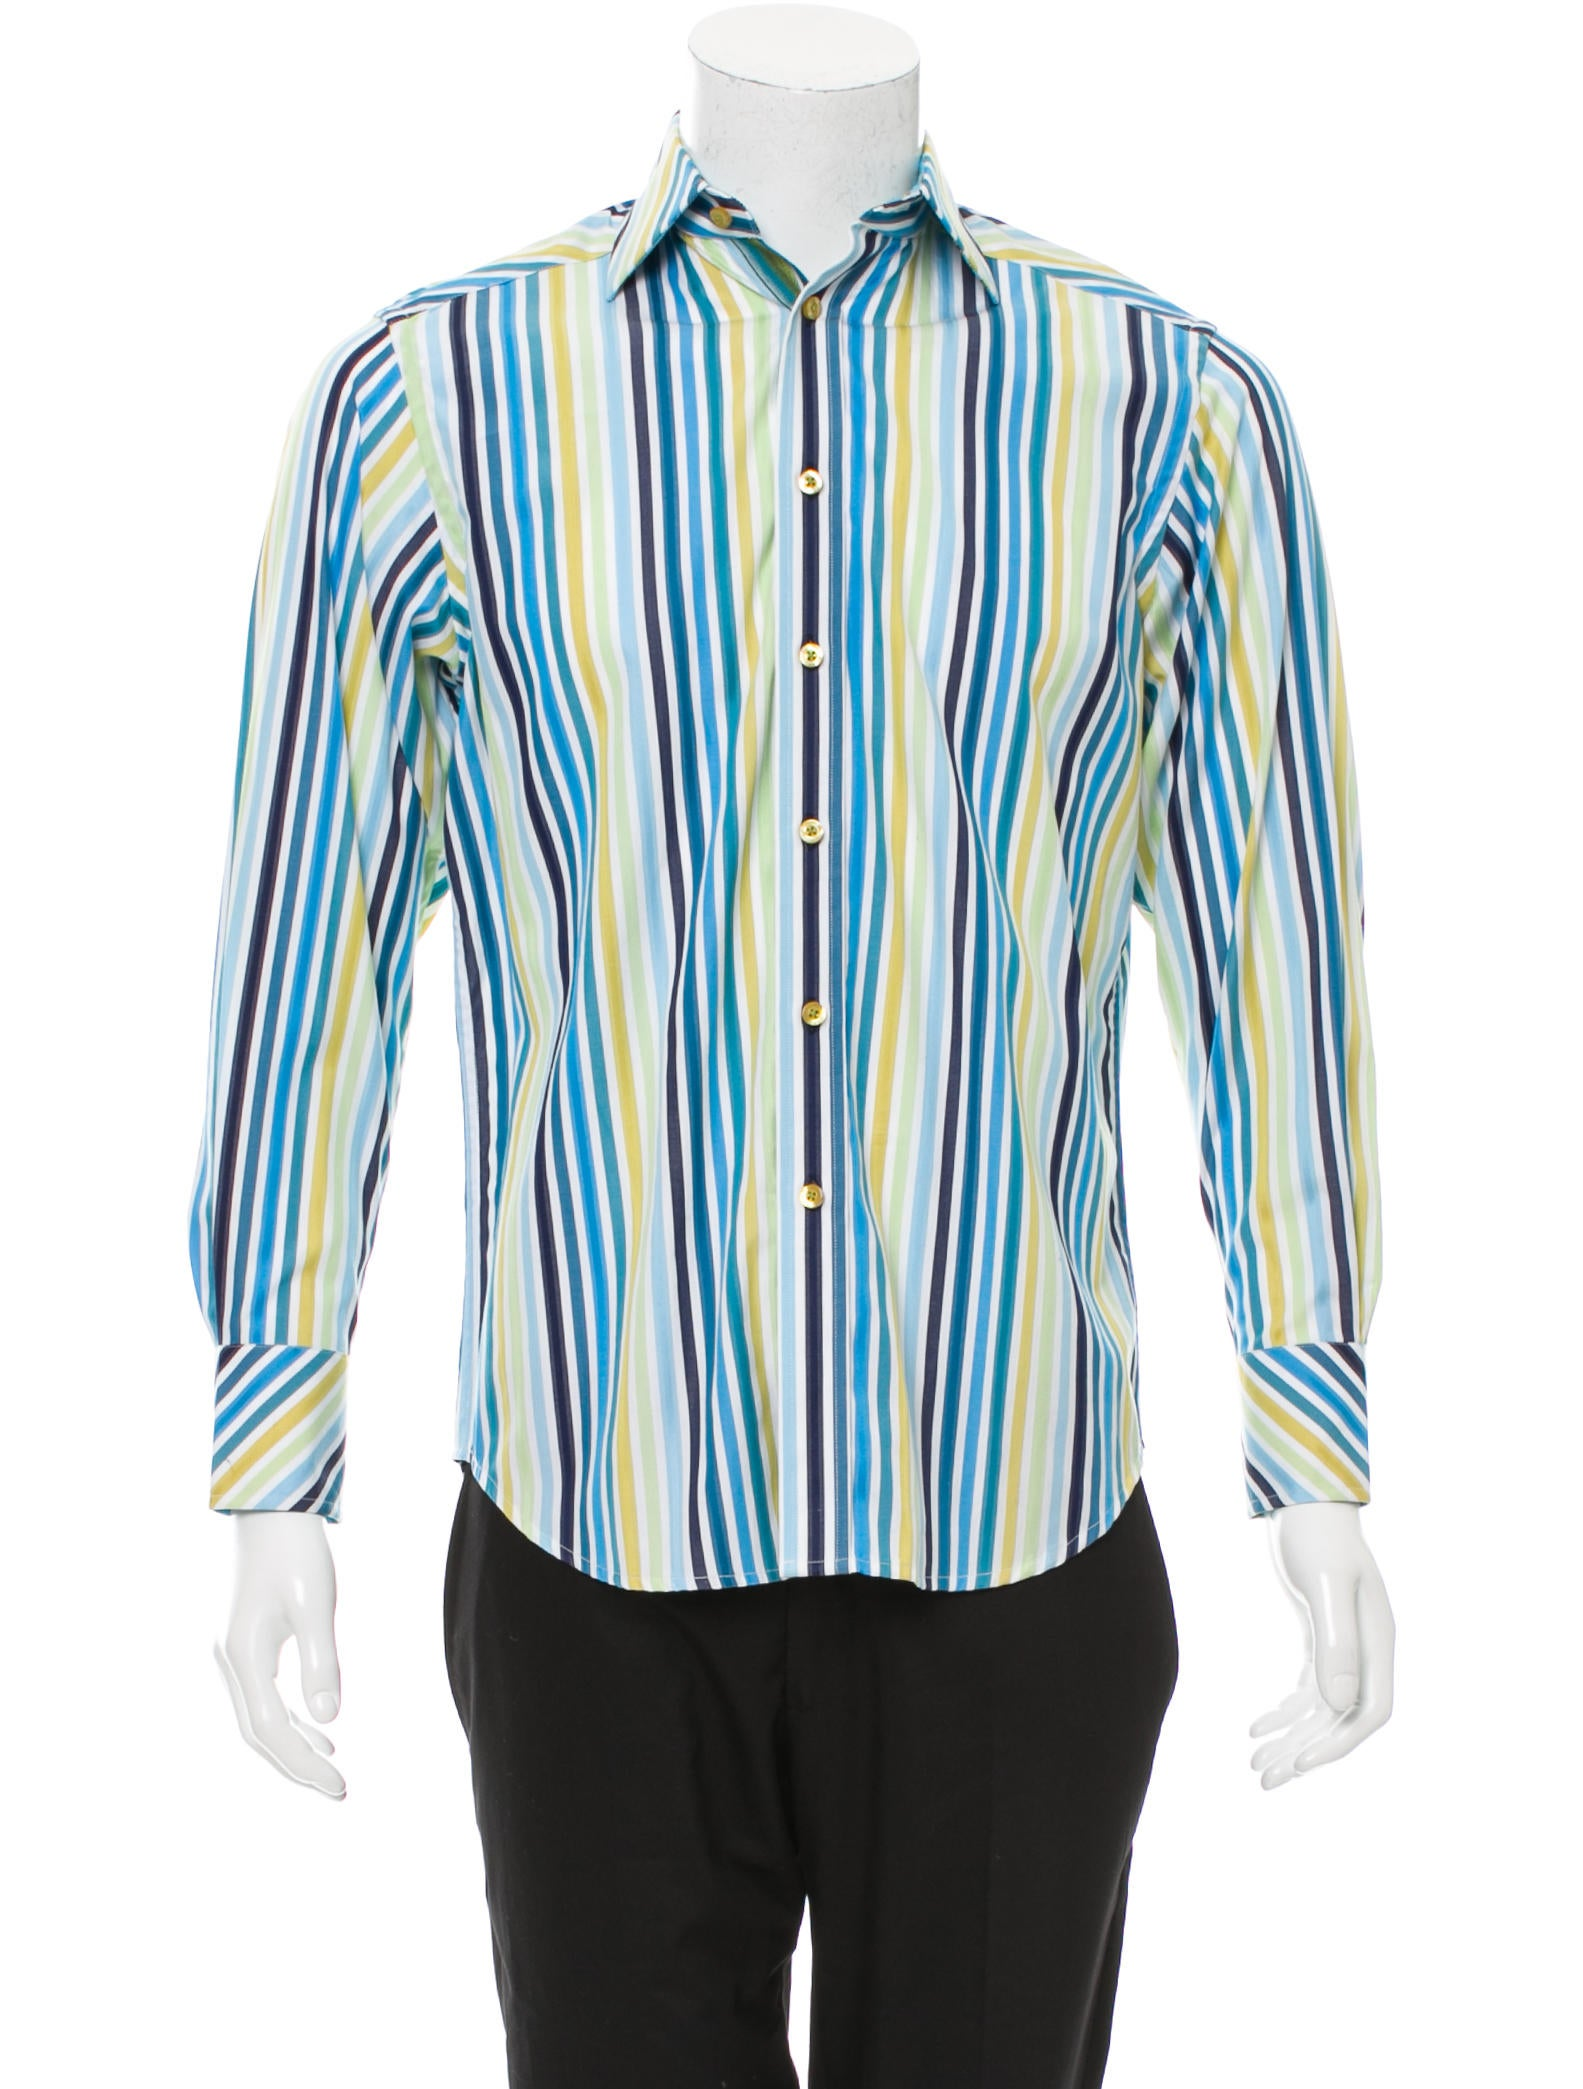 Robert graham striped button up shirt clothing for Striped button up shirt mens